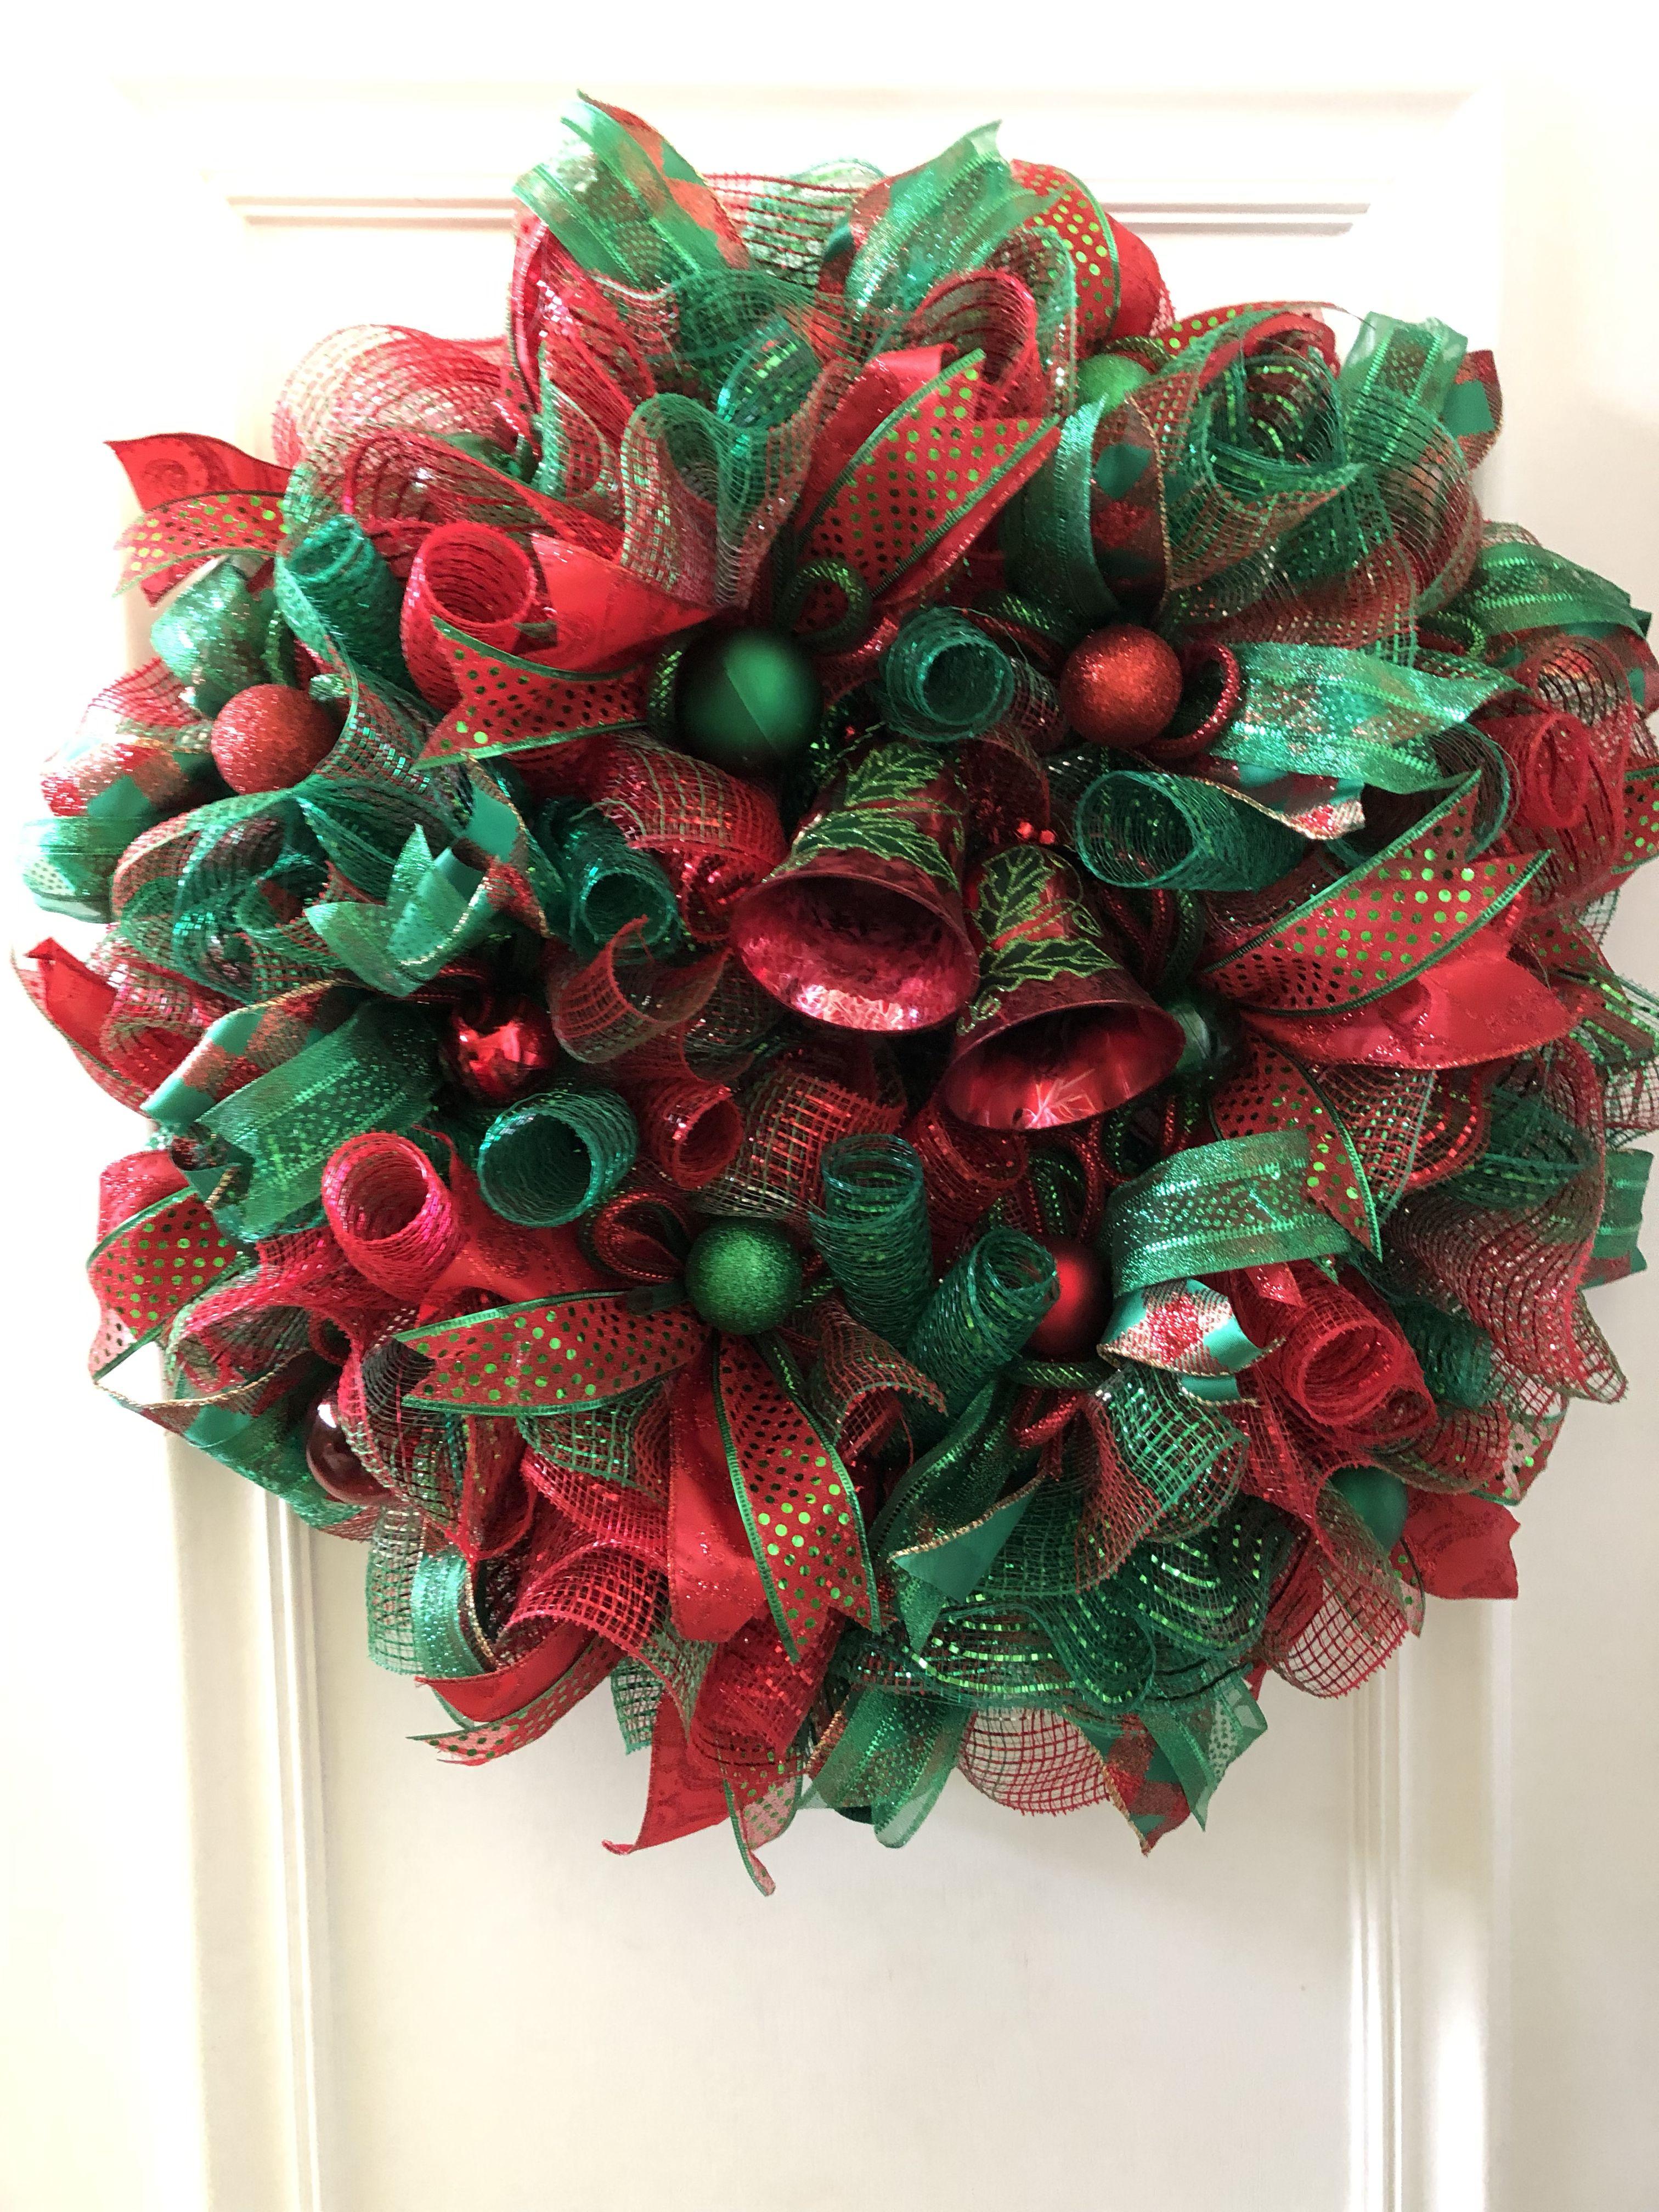 Pin by Kitkat\'z Designz on My Wreath Designs   Pinterest   Wreaths ...